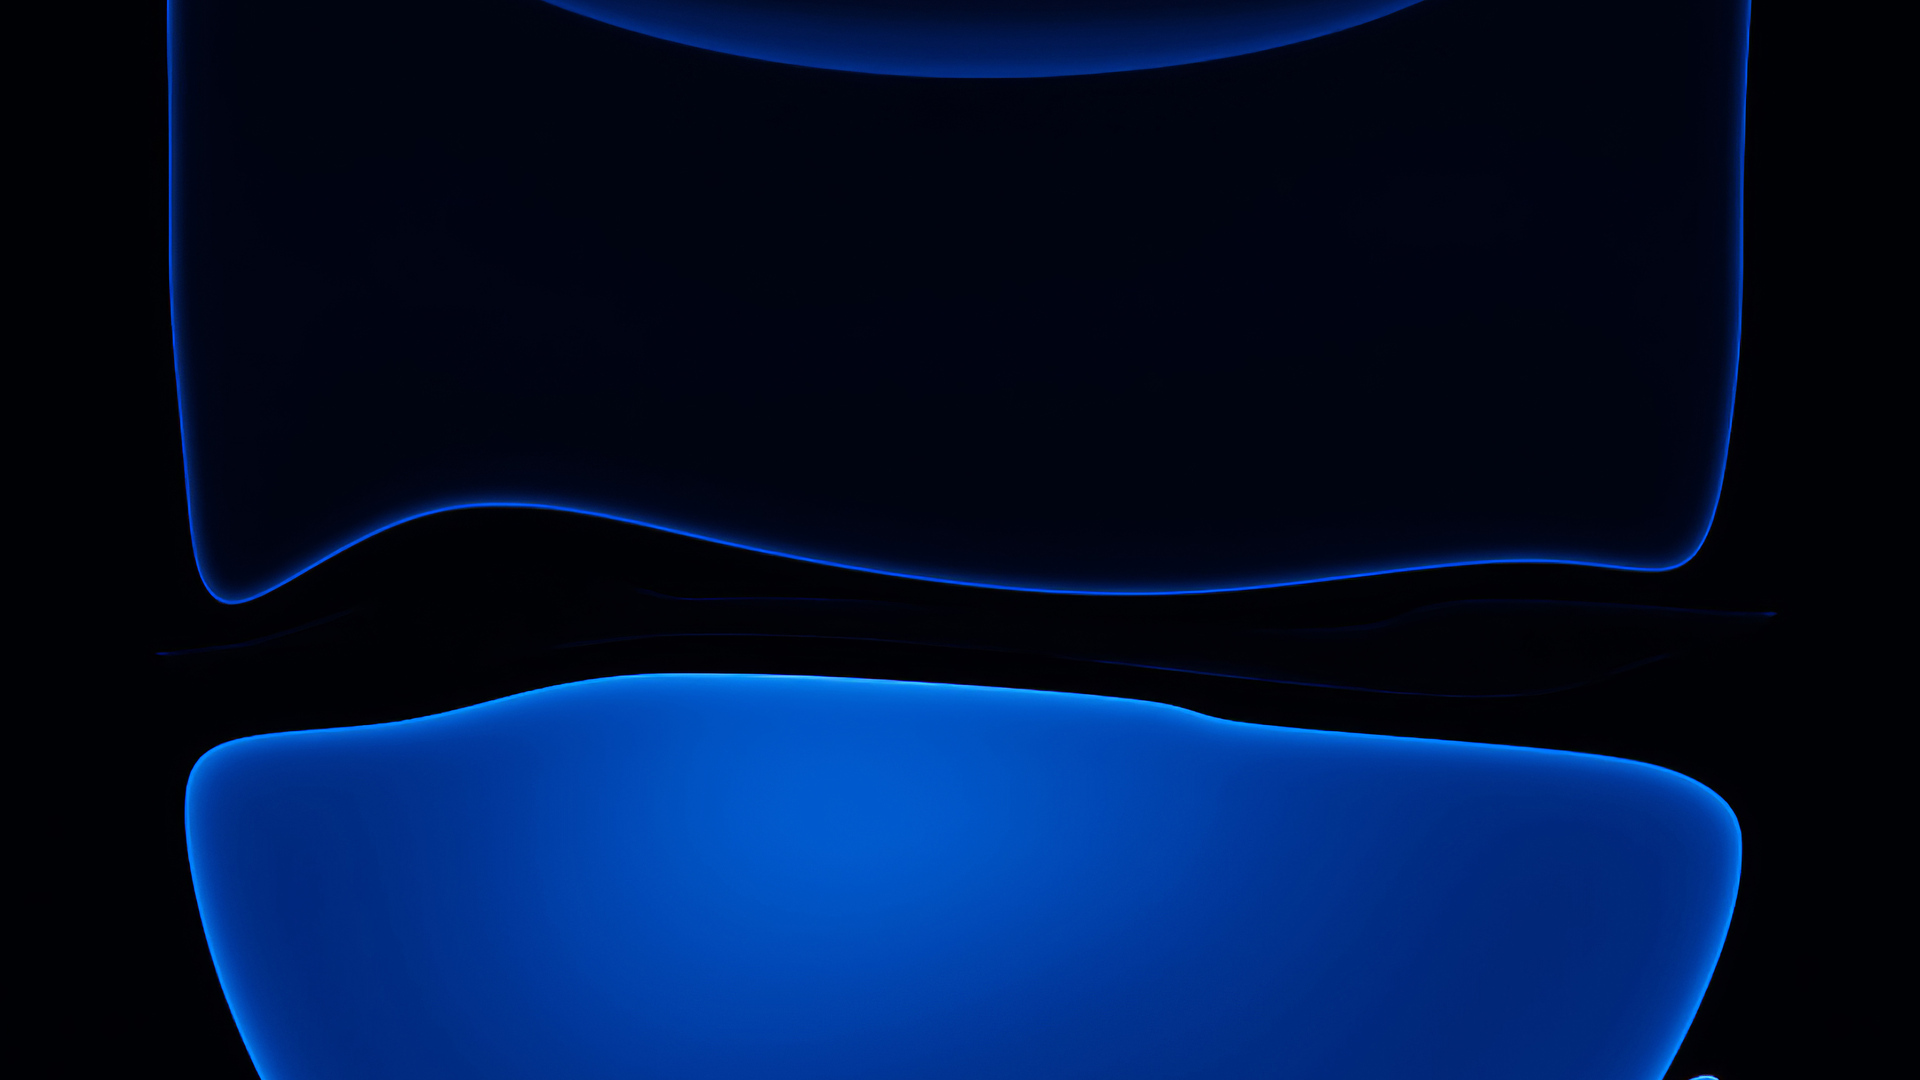 1920x1080 Ios 13 Dark Blue Laptop Full HD 1080P HD 4k ...